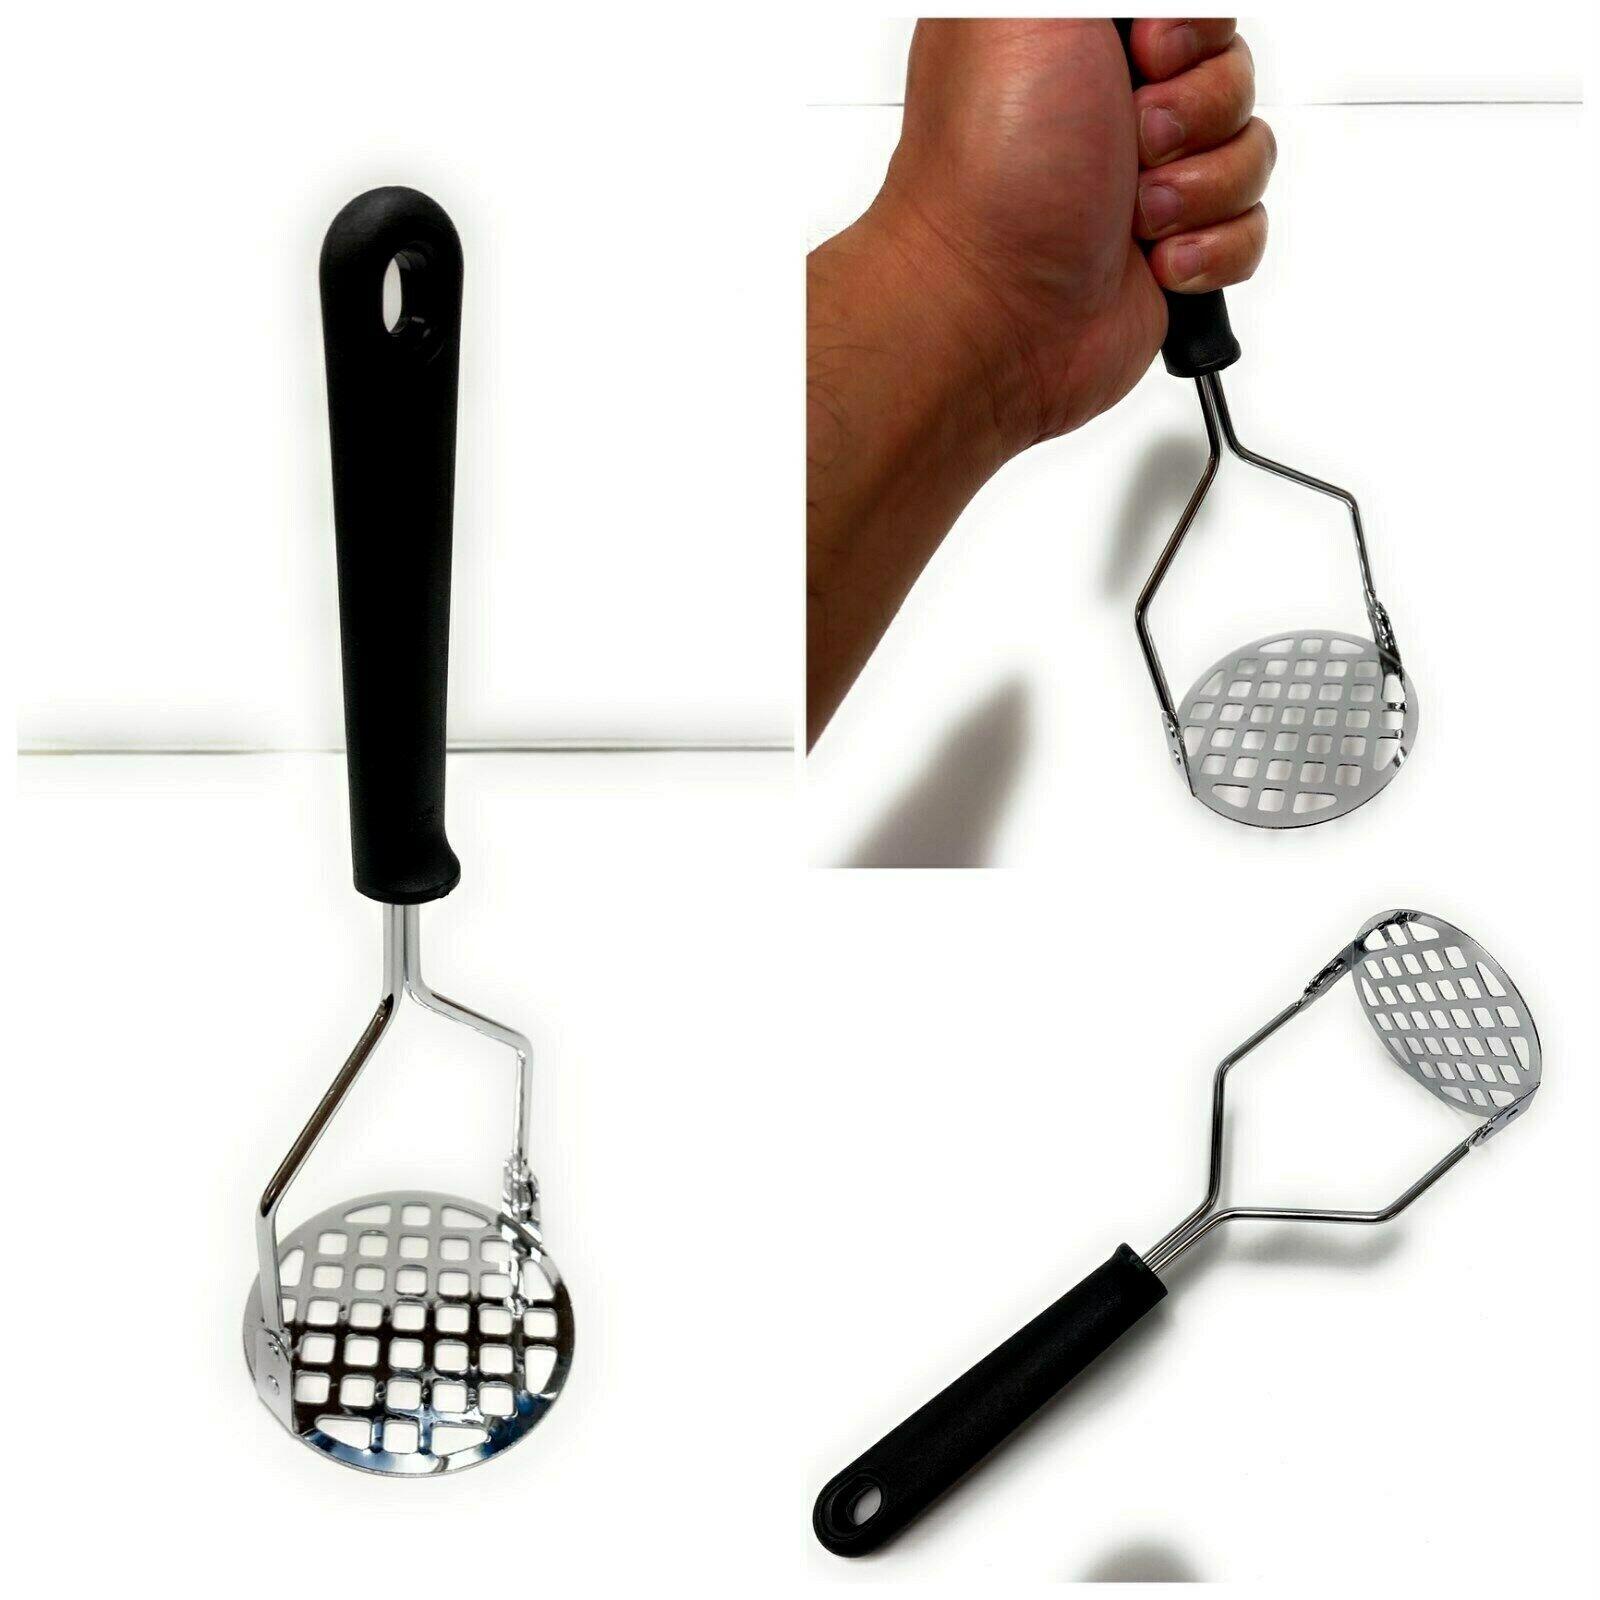 Oval Stainless Steel Potato Ricer Masher Kitchen Utensil Handheld Press Tool